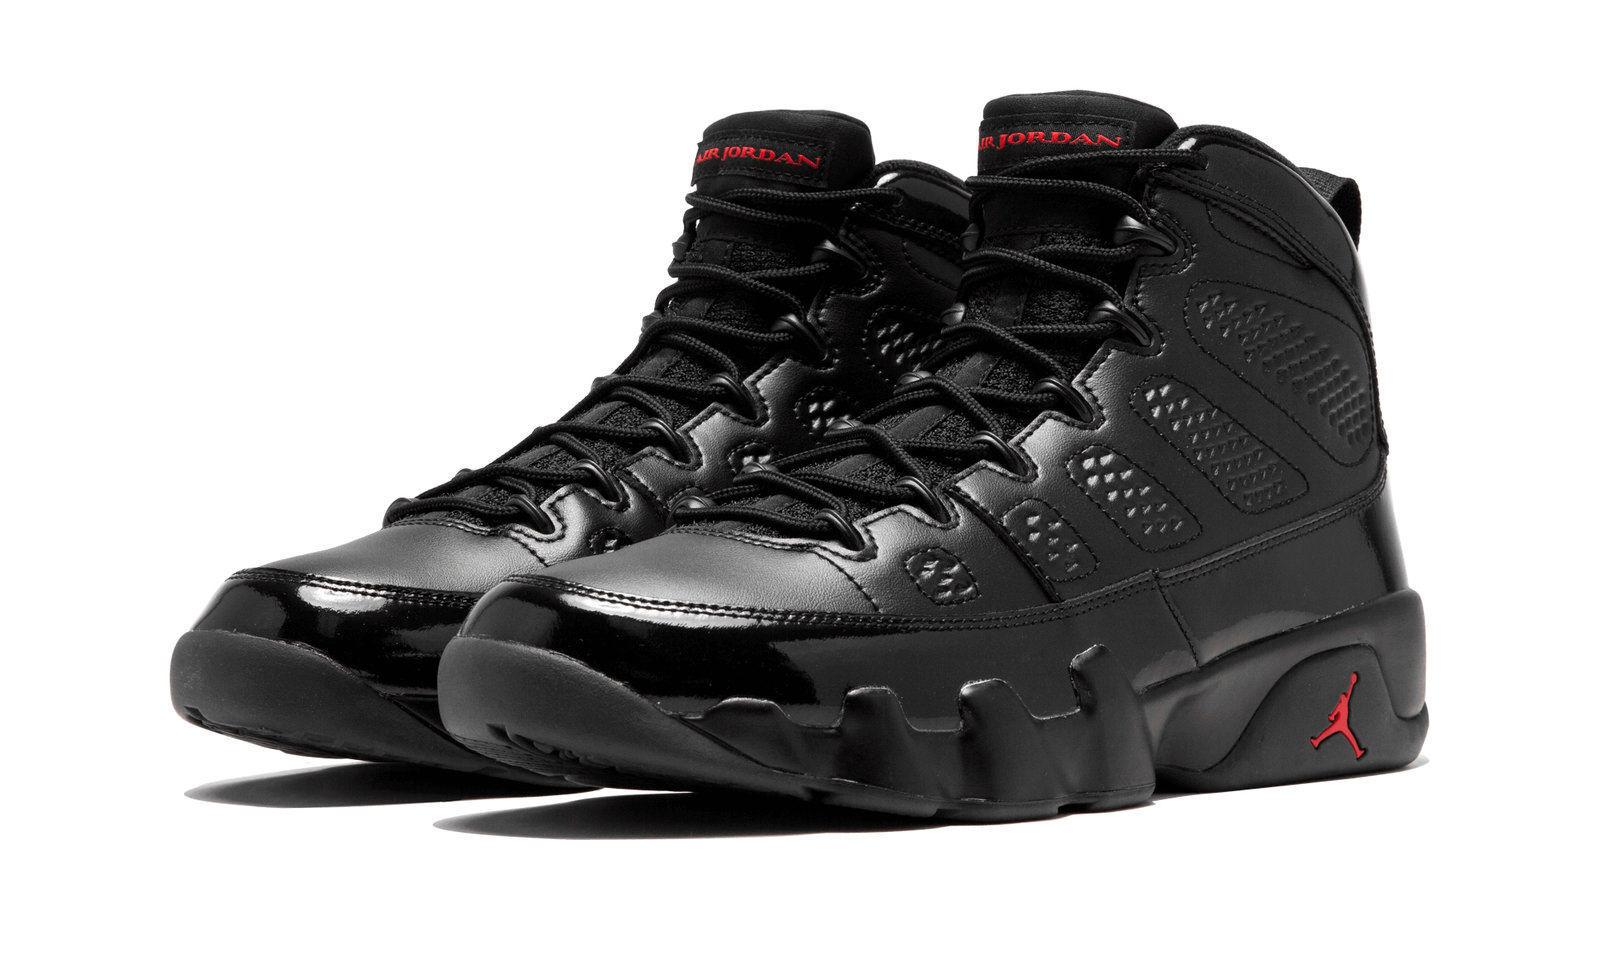 Air Jordan 9 IX Retro Bred Black Red size 8.5. 302370-014. playoff